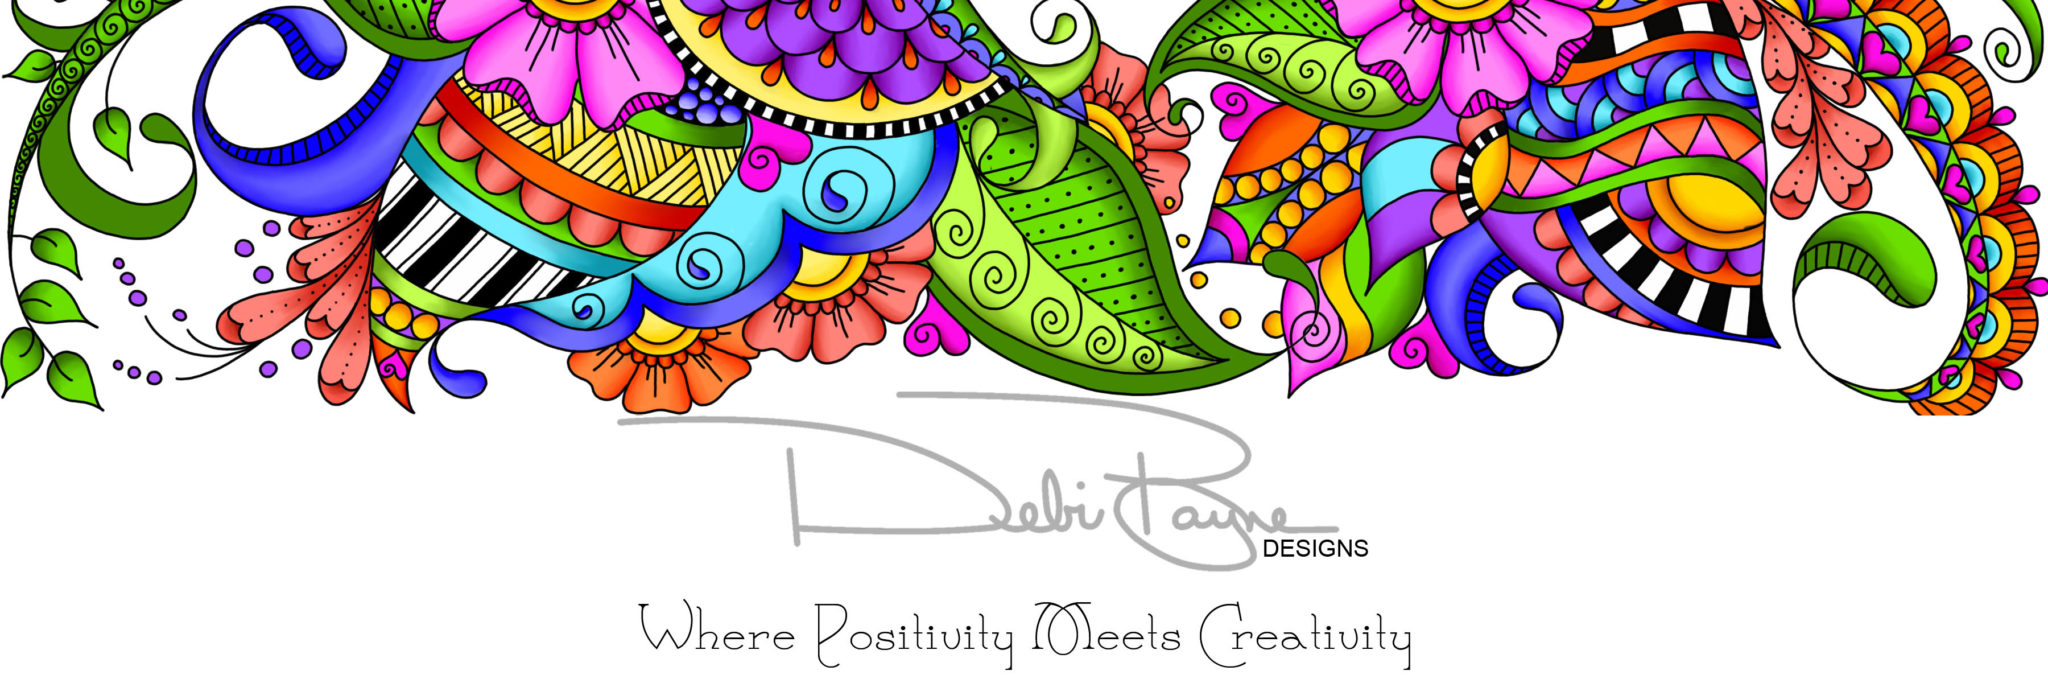 Image: Debi Payne Designs